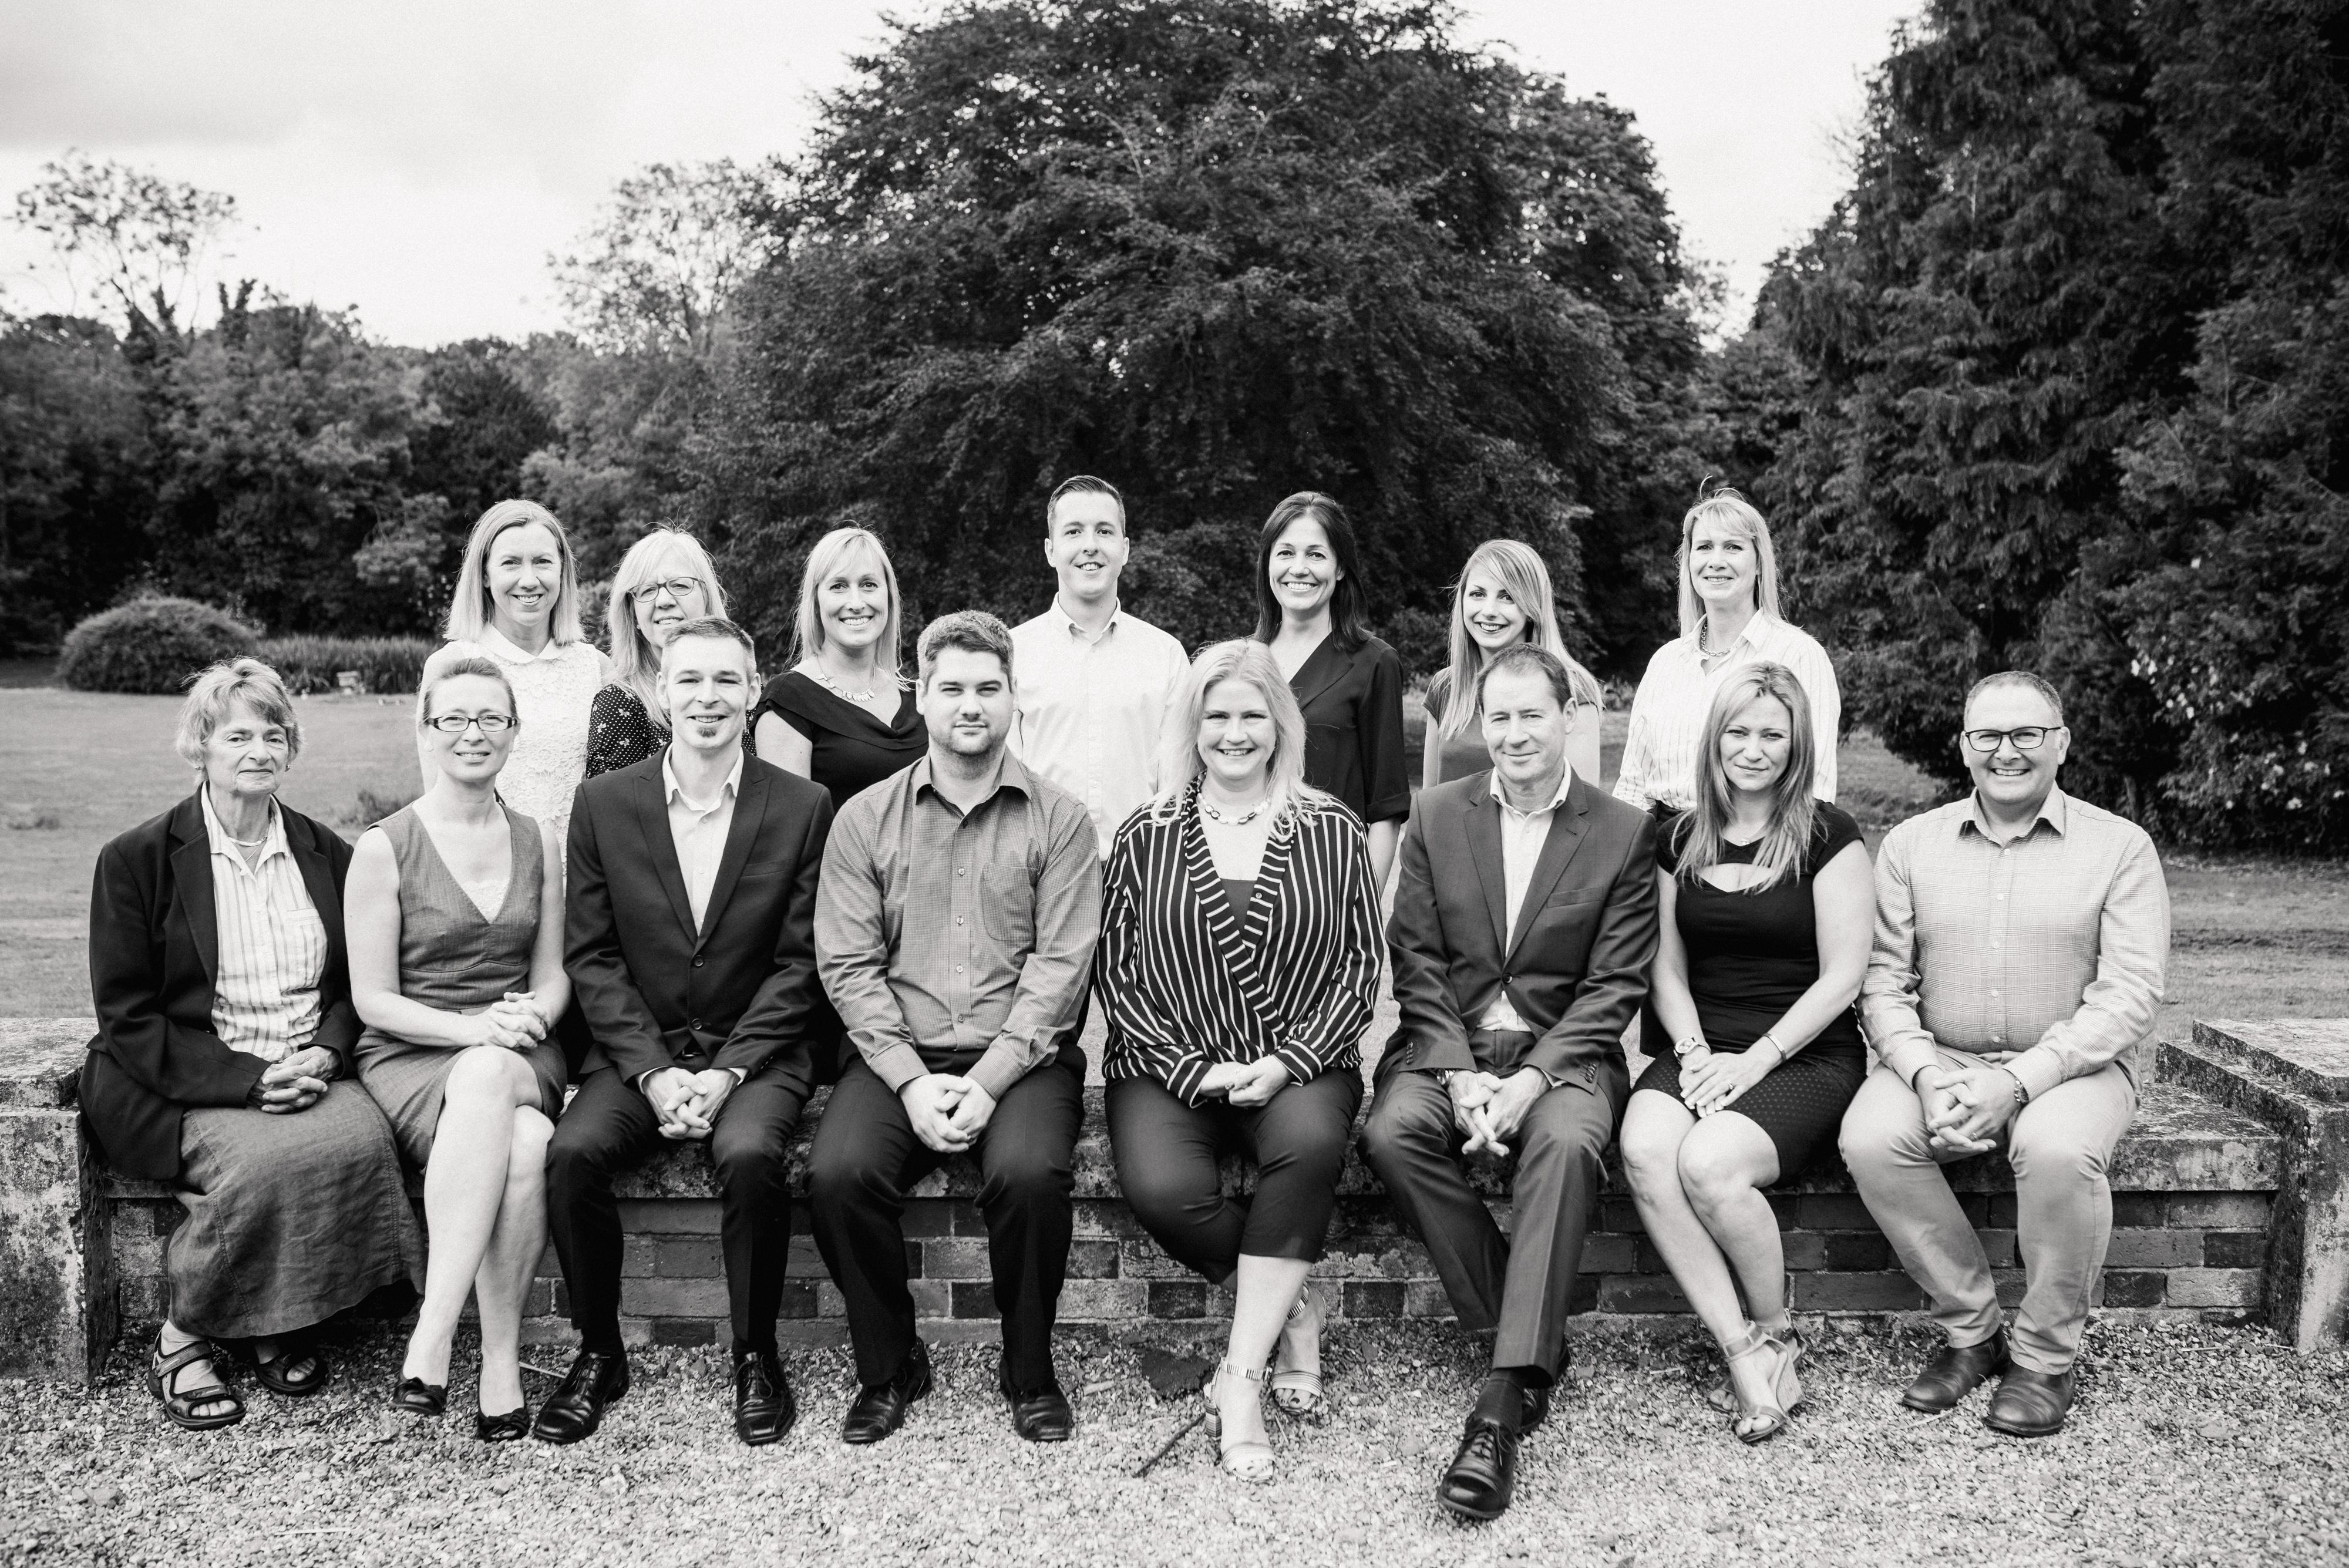 The Team - Plus Finance